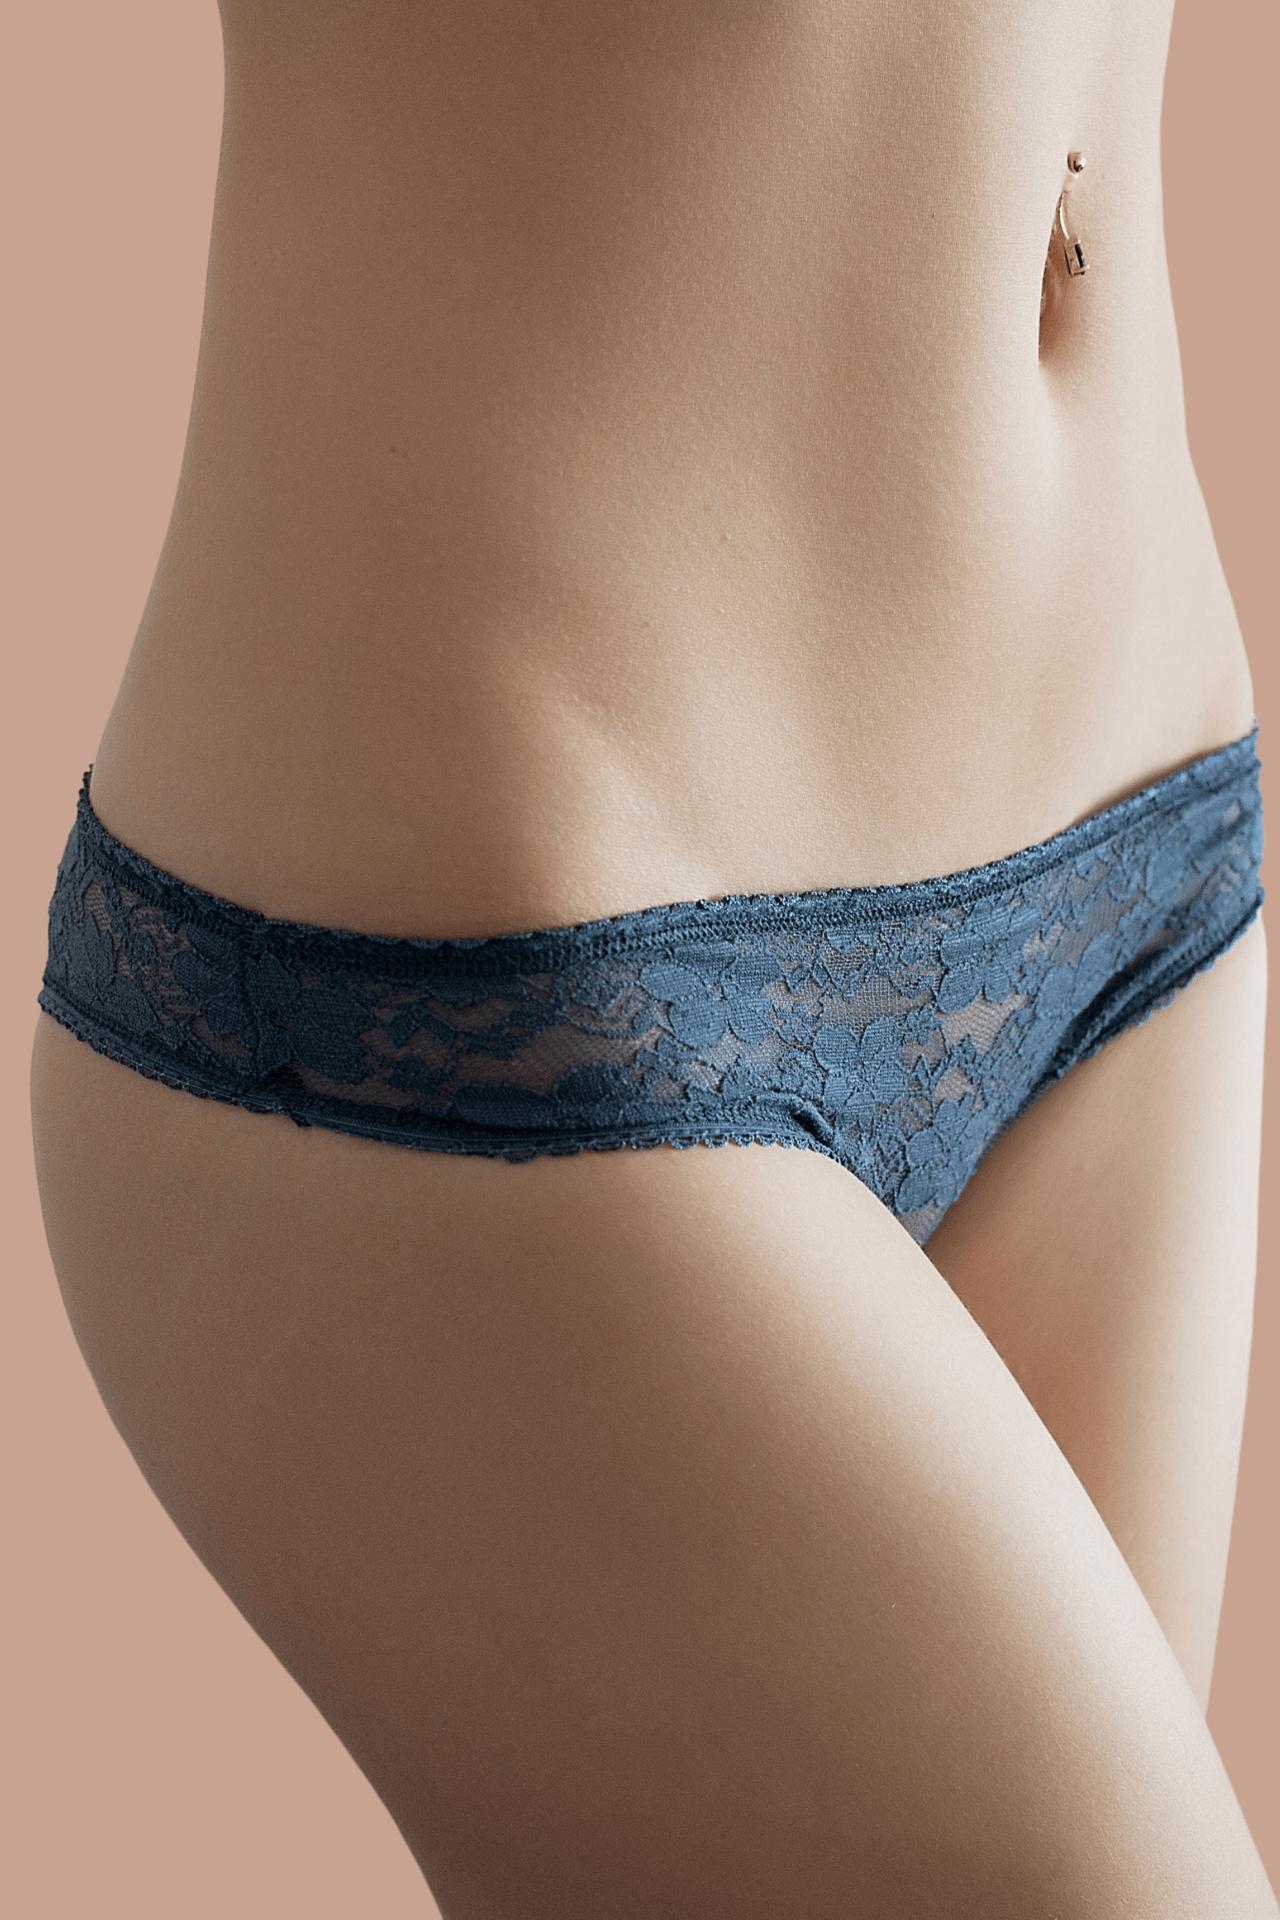 A womans abdomen after a truSculpt iD Body contouring treatment